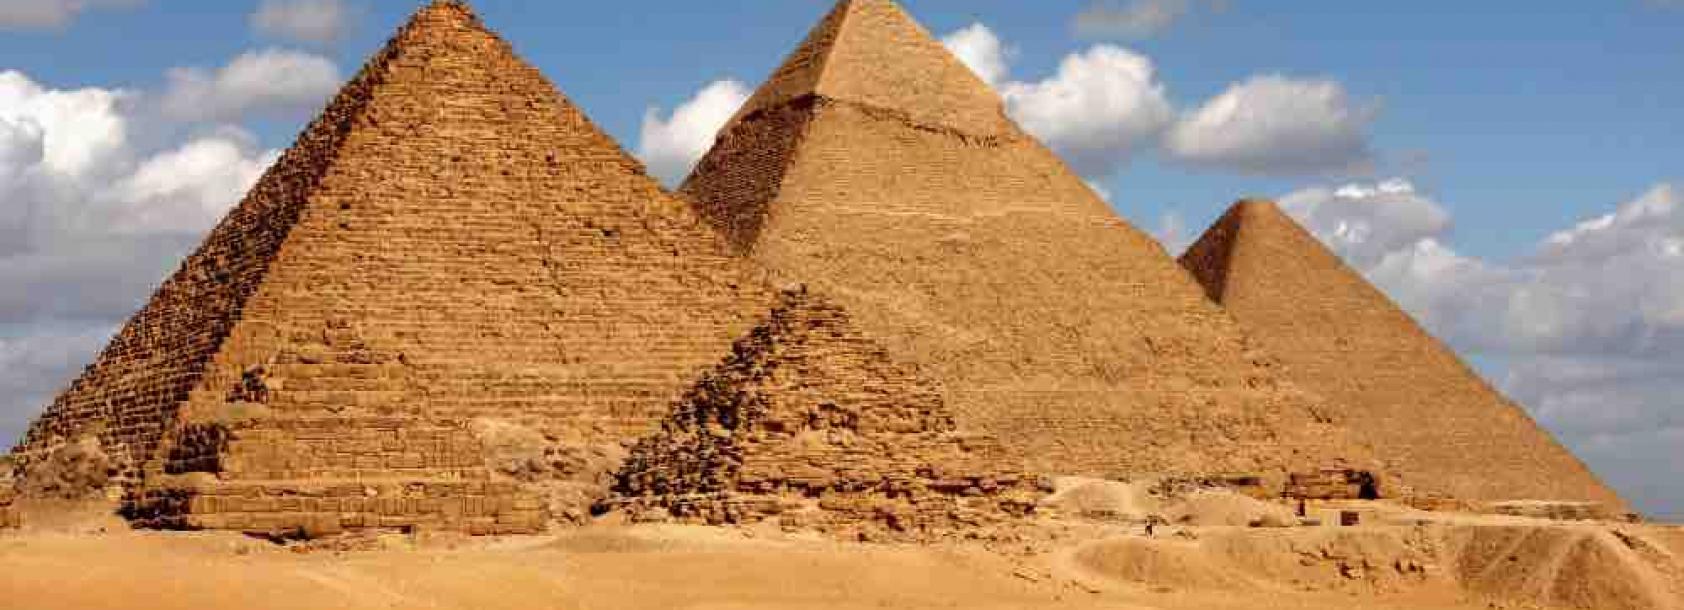 Egypt_Giza pyramid